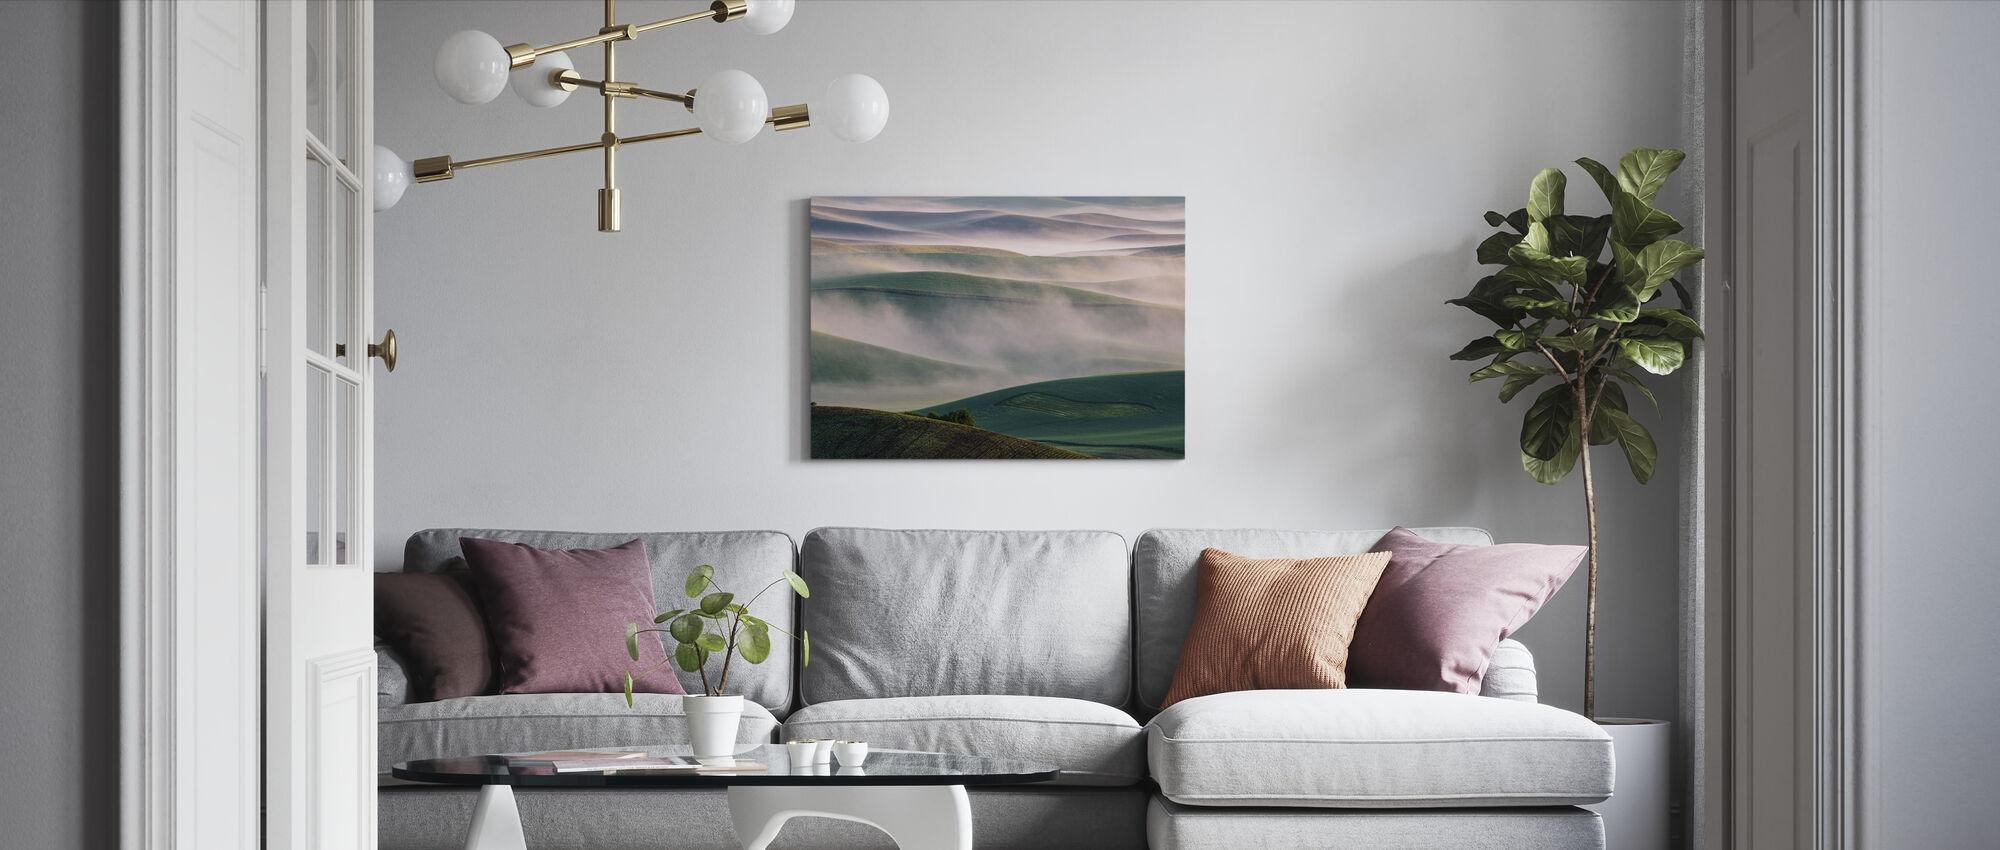 Dream Land in Morning Mist - Canvas print - Living Room